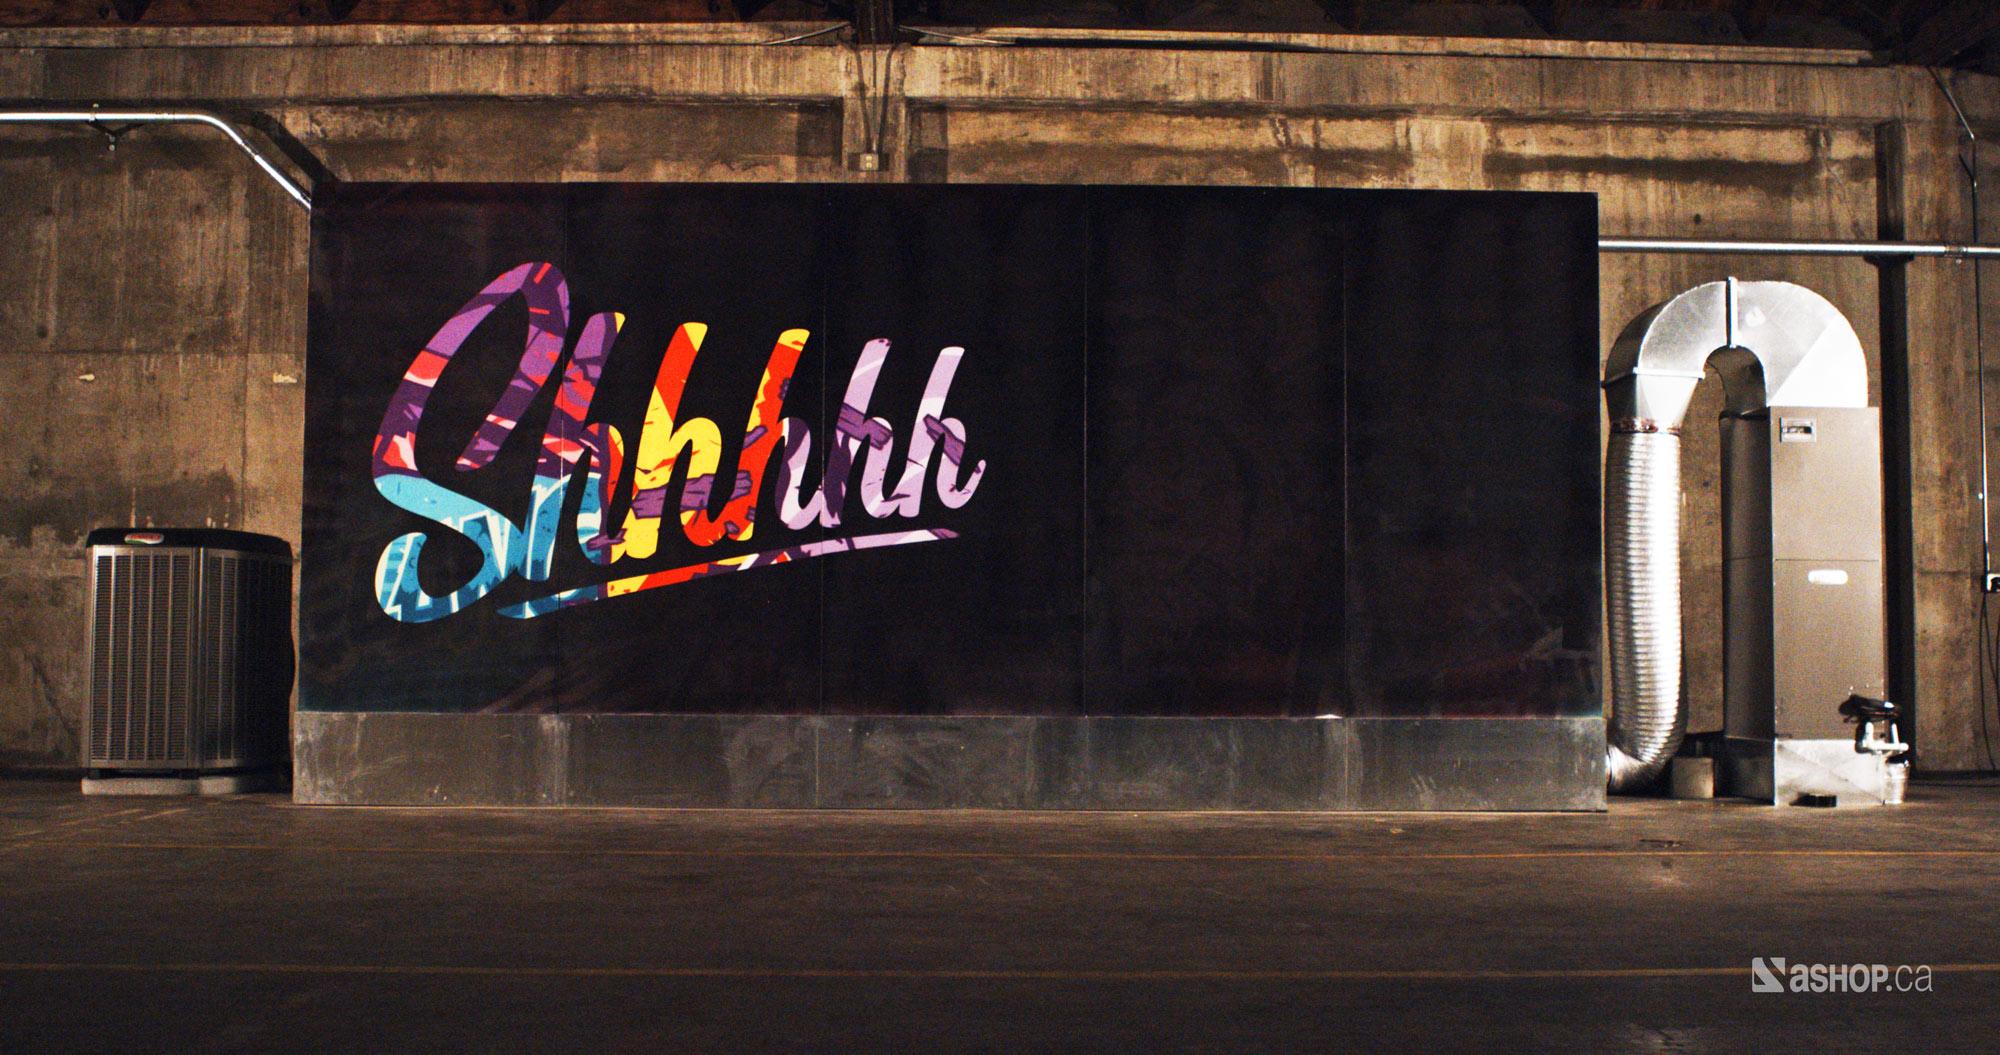 lennox_123klan_after_ashop_a'shop_mural_murales_graffiti_street_art_montreal_paint_WEB.jpg